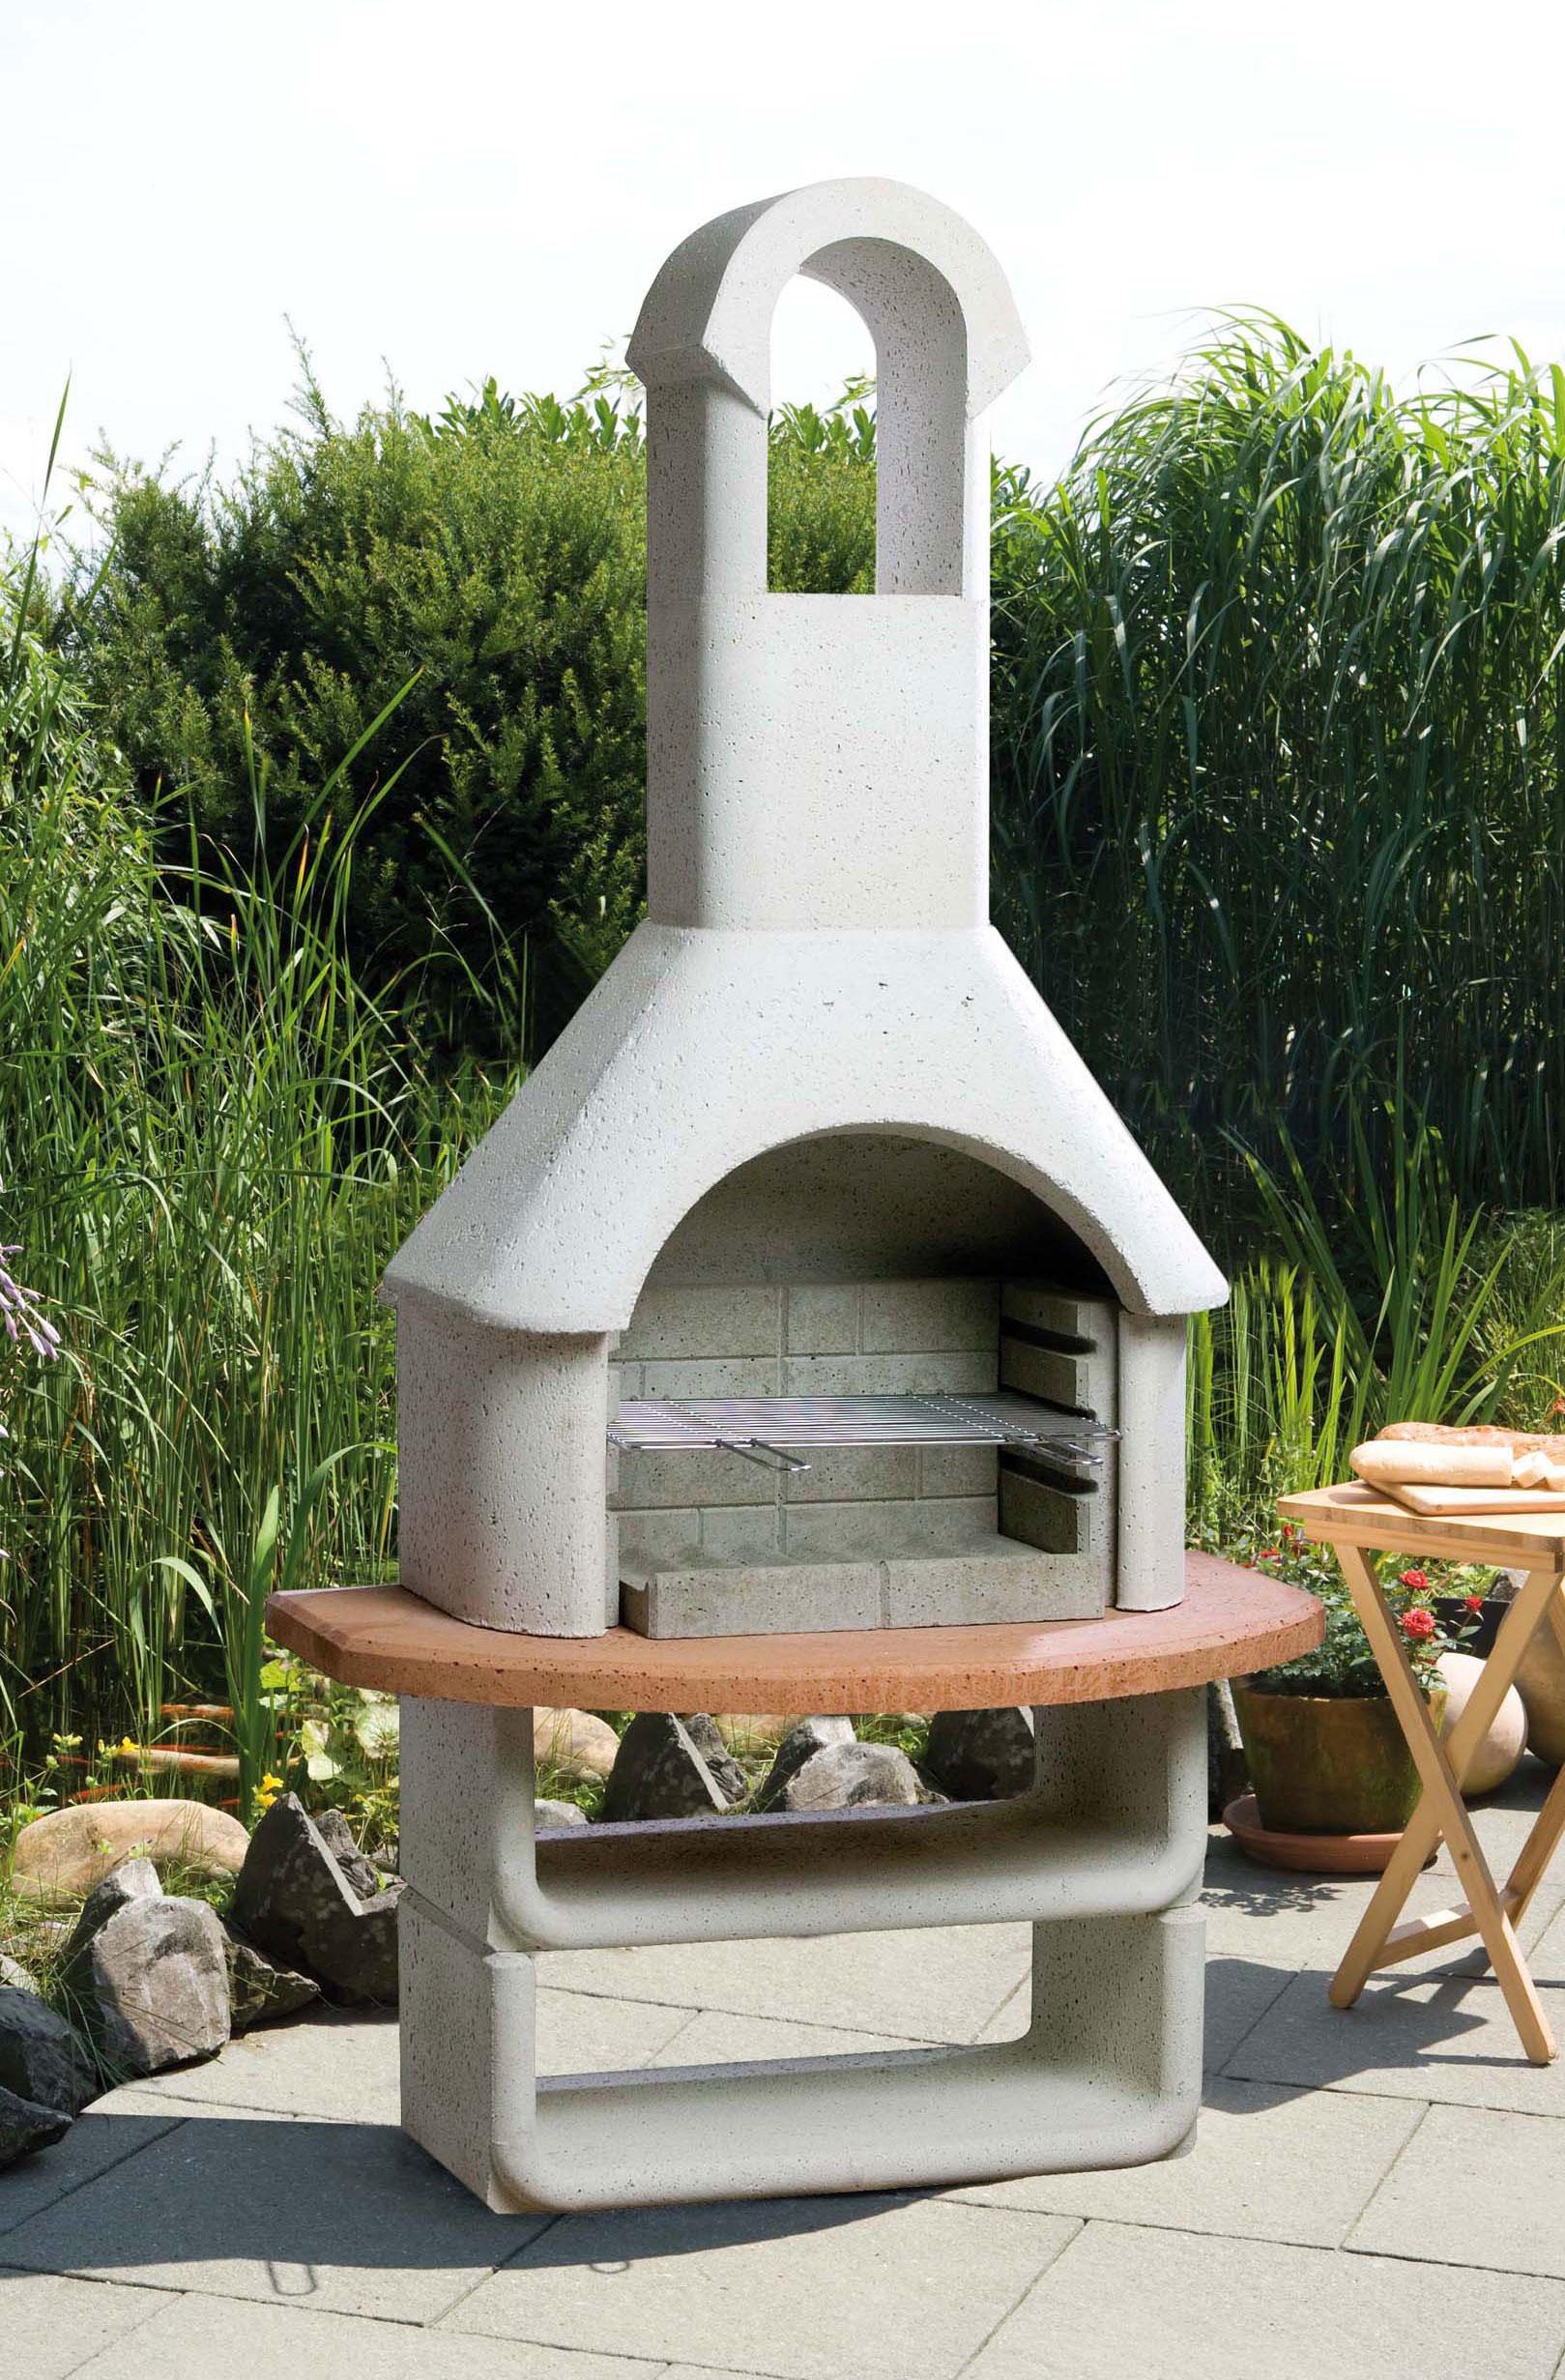 gartenkamin grillkamin buschbeck las palmas 110x65x206cm bei. Black Bedroom Furniture Sets. Home Design Ideas